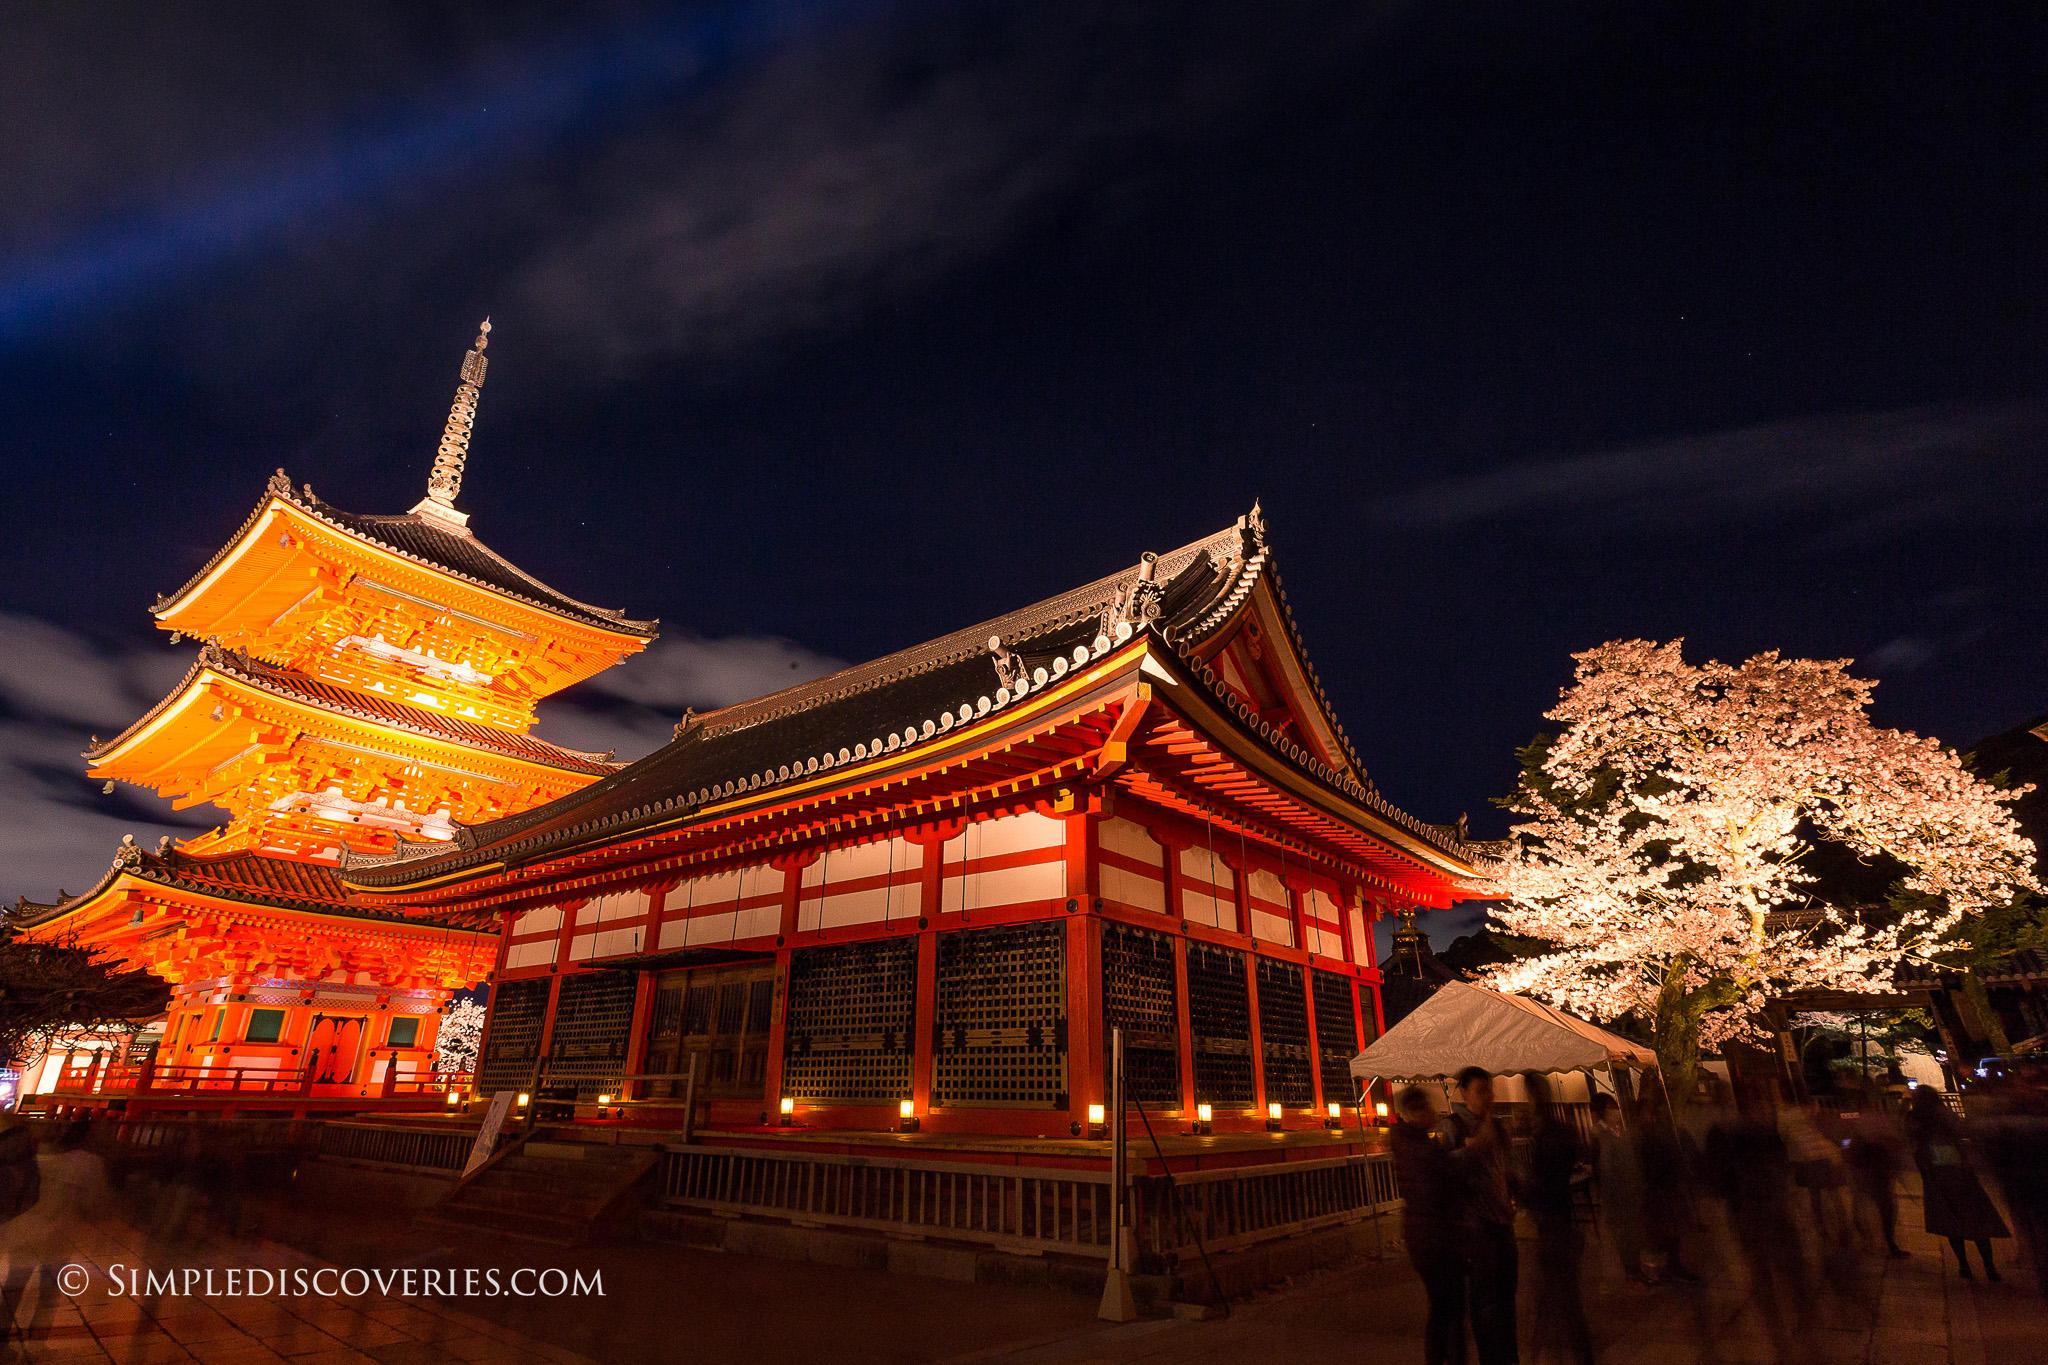 Japan_Kiyomizu_dera_Temple